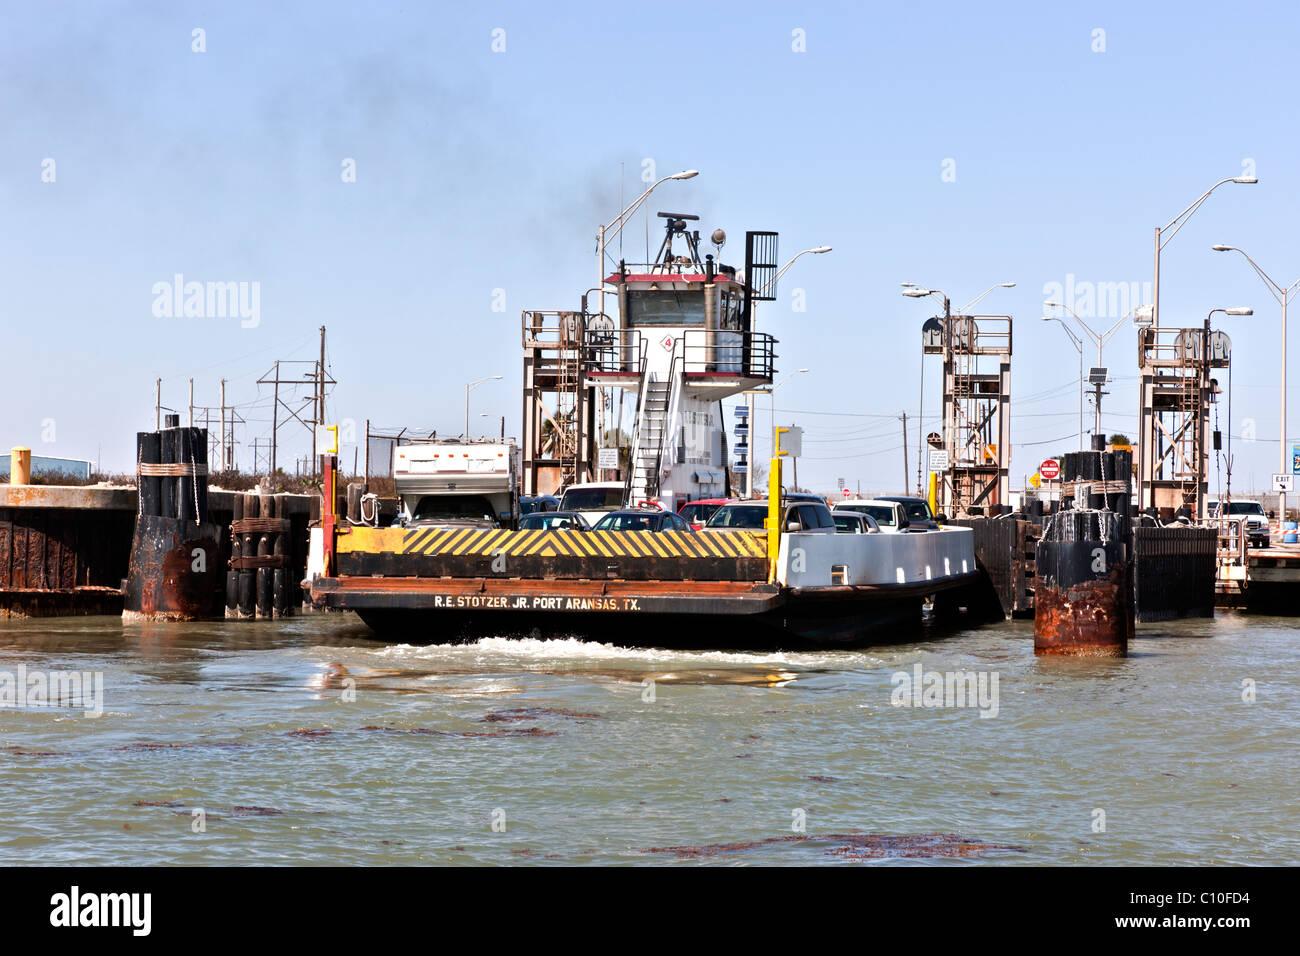 Partiendo de Ferry Port Aransas, TX Imagen De Stock